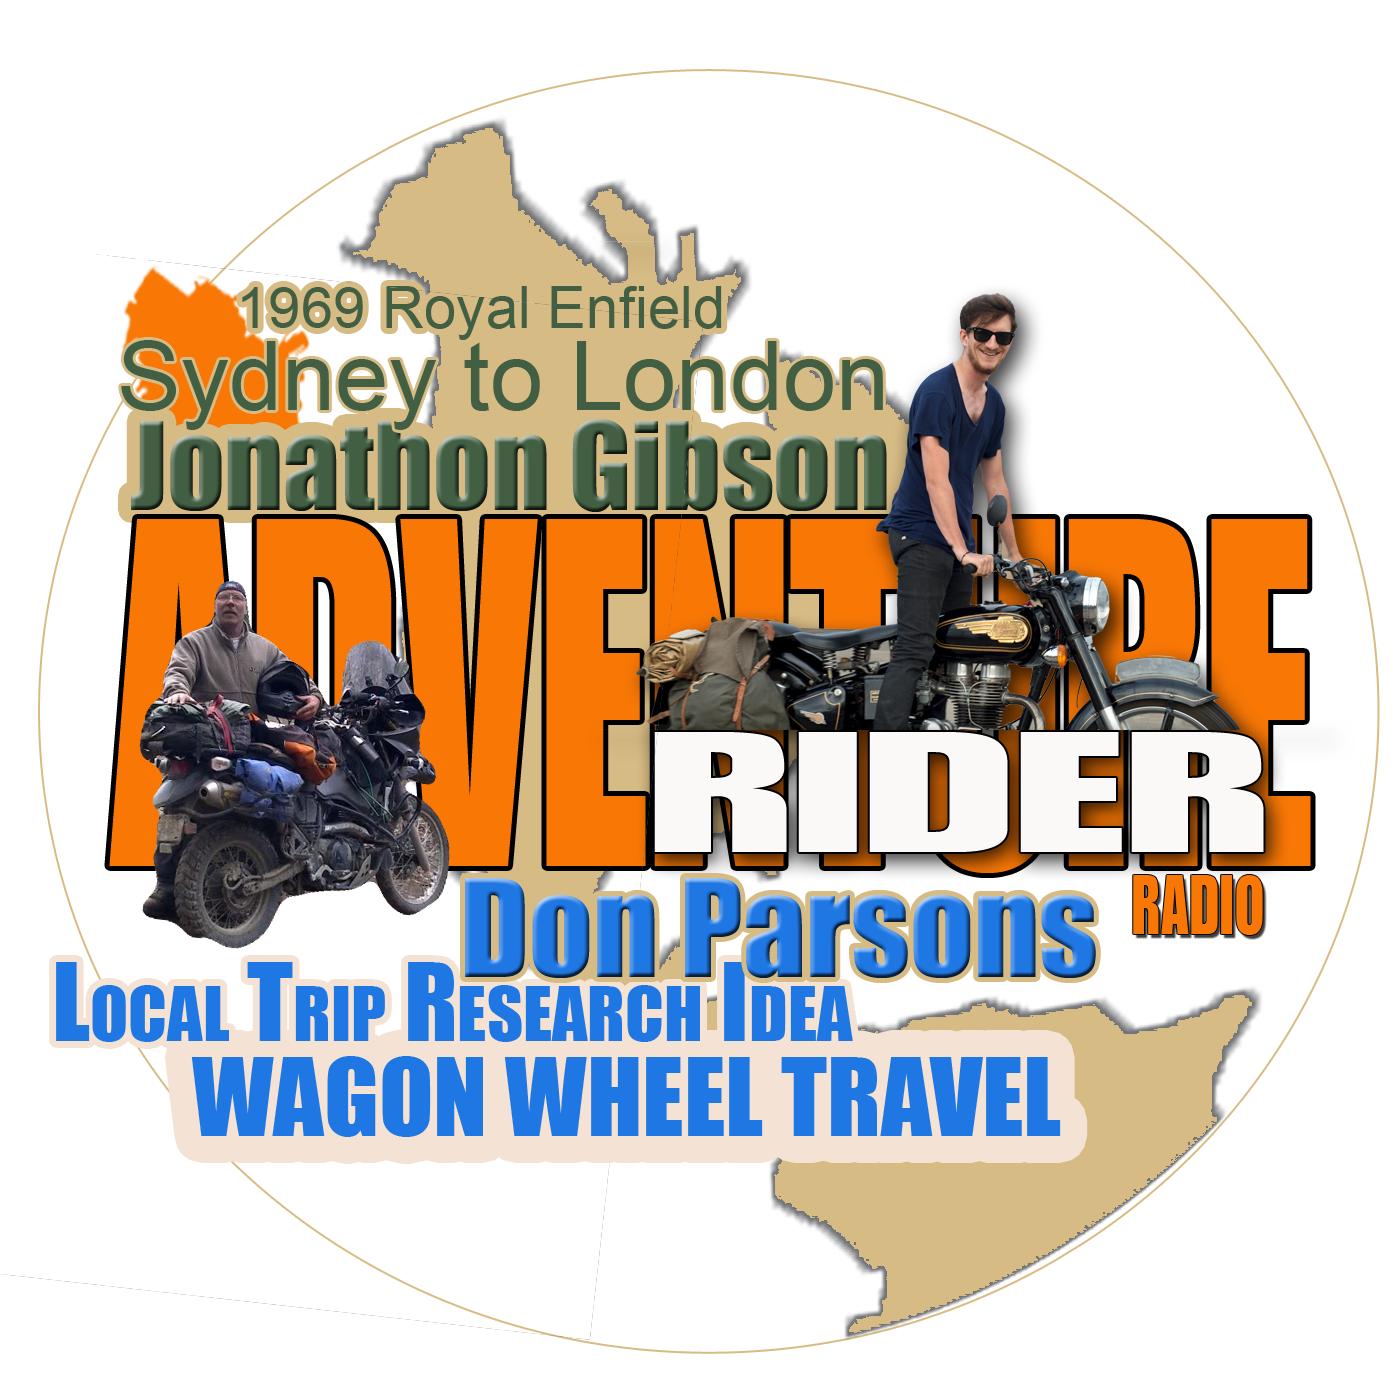 Motorbike-Adventures-Royal-Enfield-Trip-Planning-using-Local-Motorbike-Forums